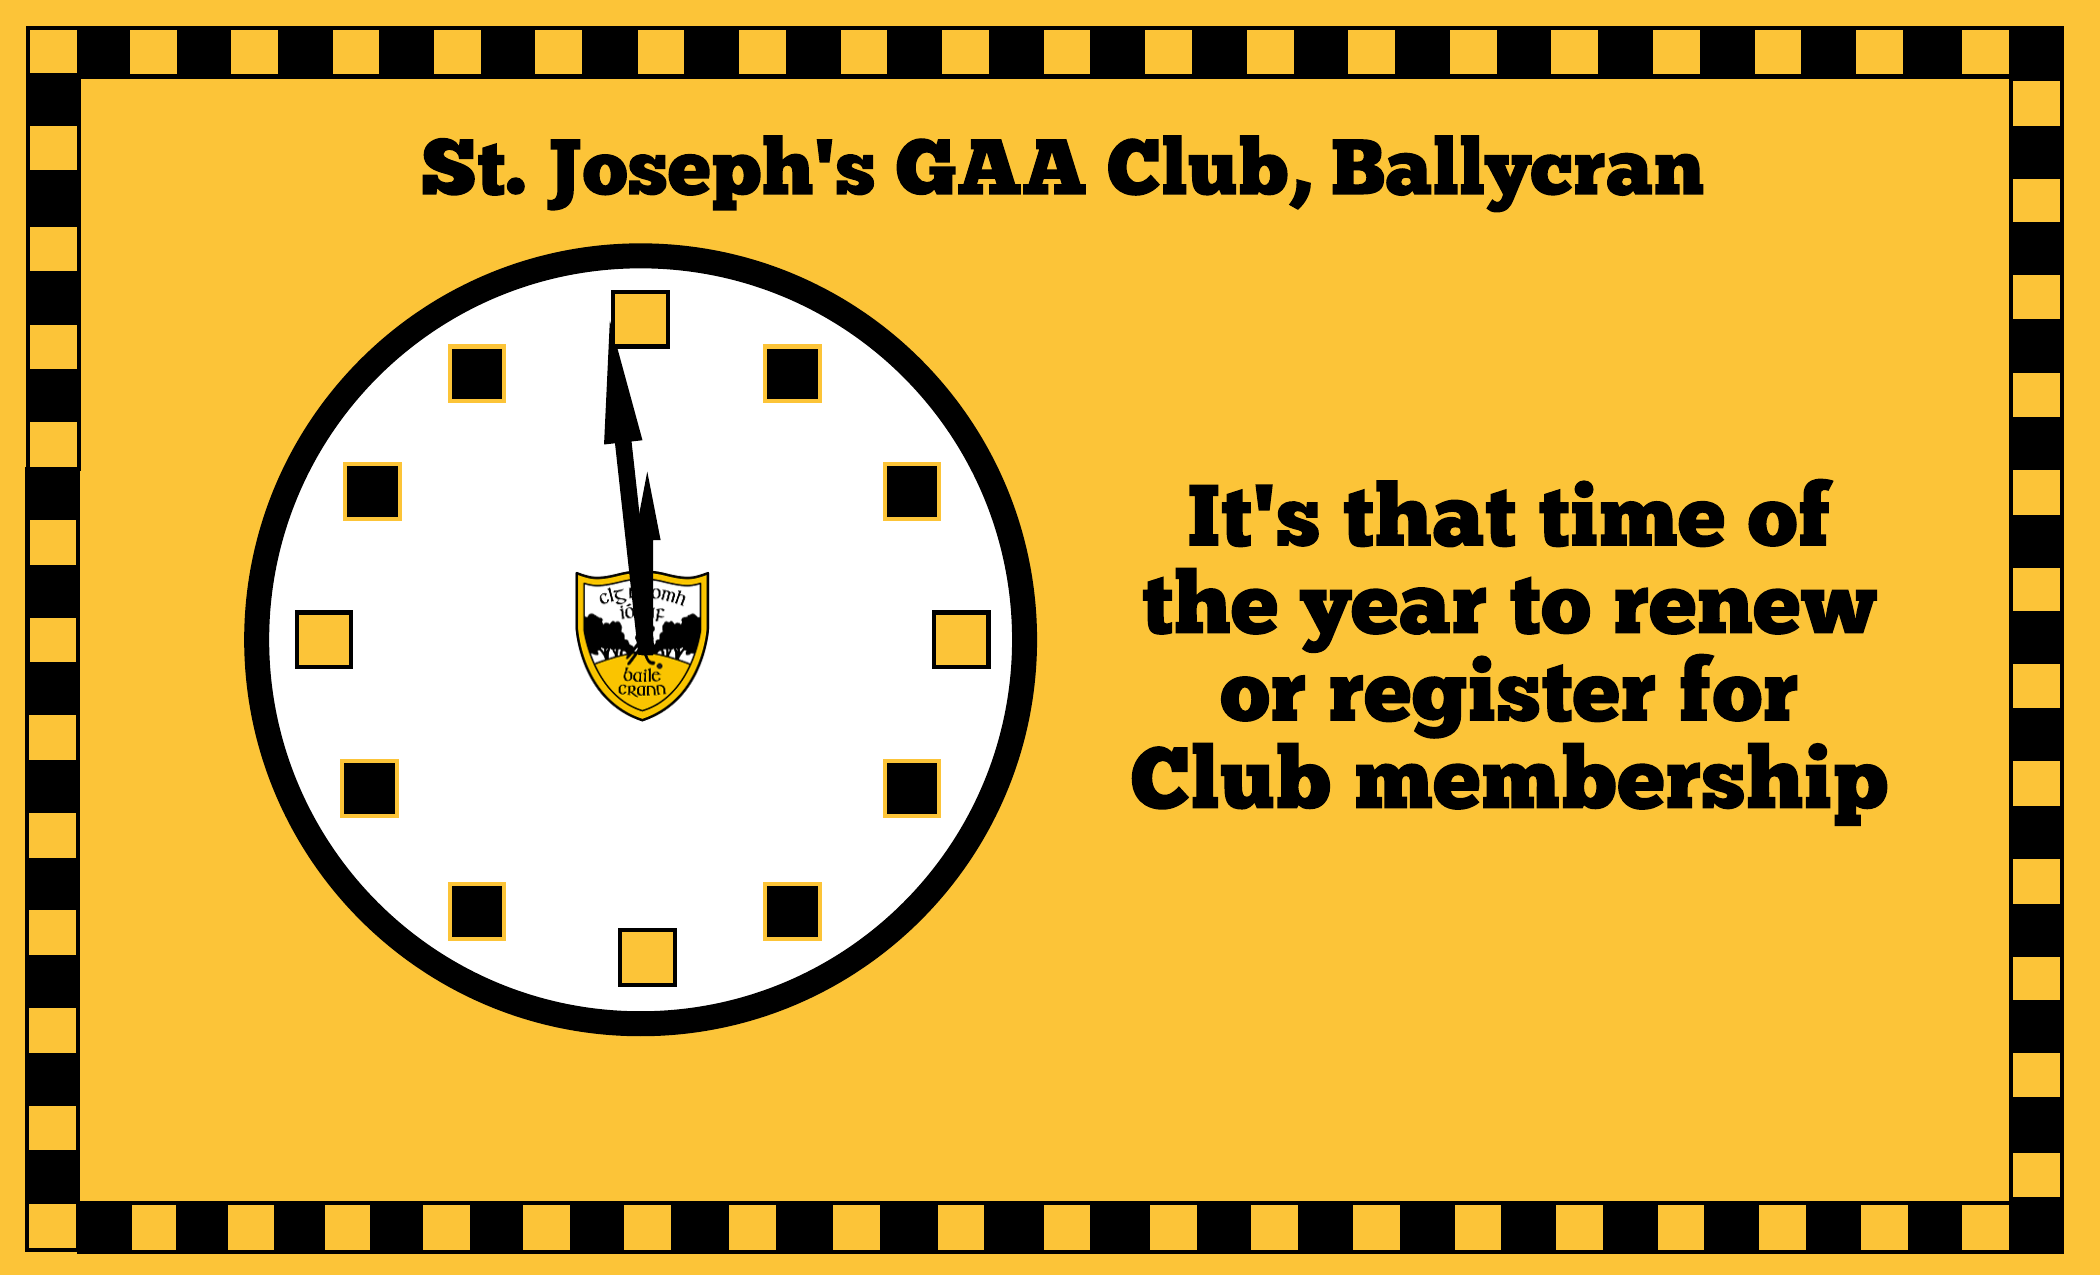 Membership renewal is upon us once again